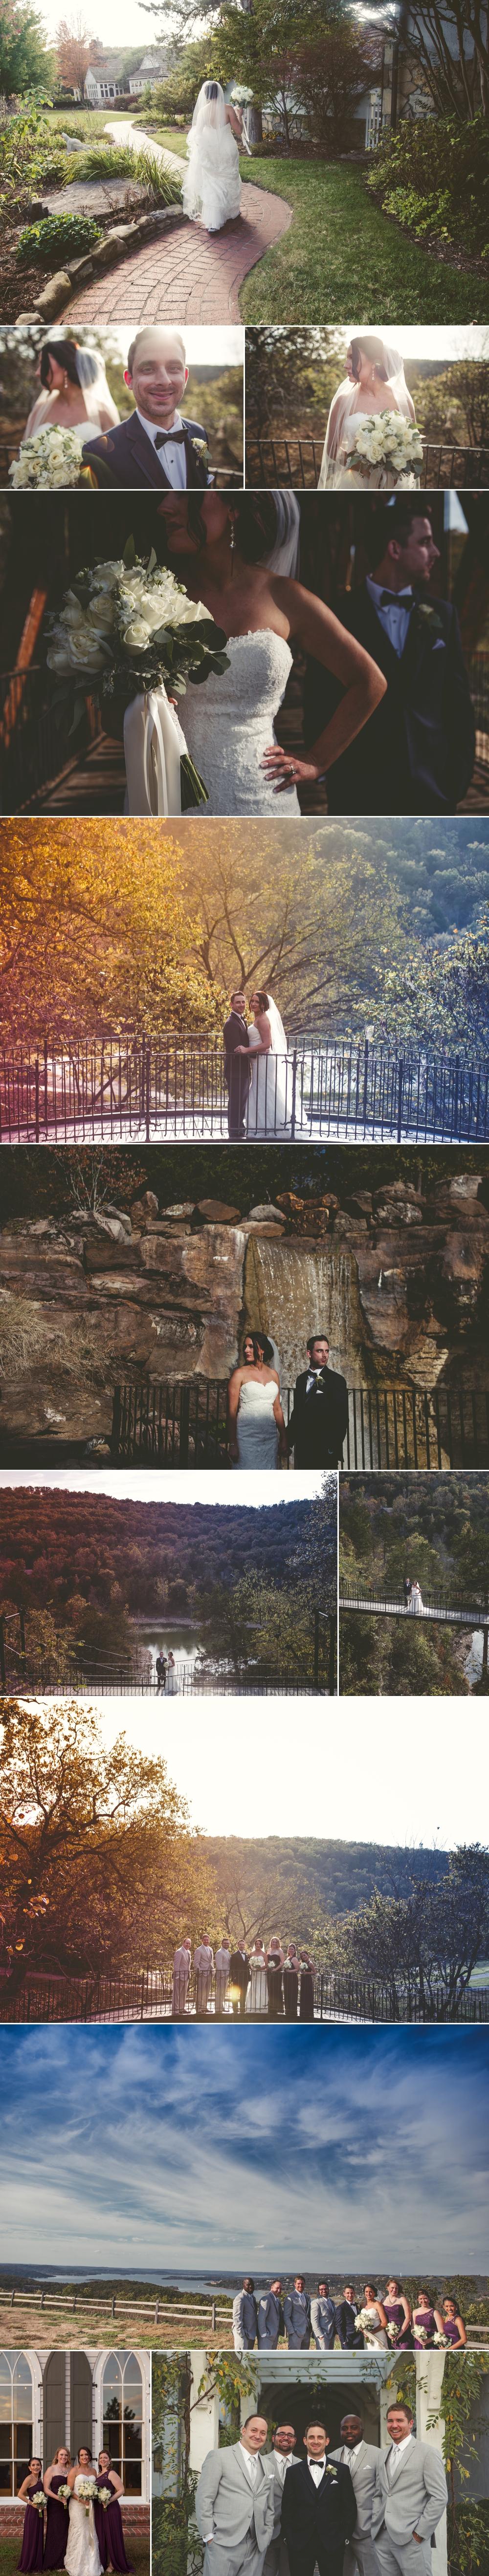 jason_domingues_photography_-best_kansas_city_photographer_big_cedar_lodge_wedding_ozark_kc_missouri_0002